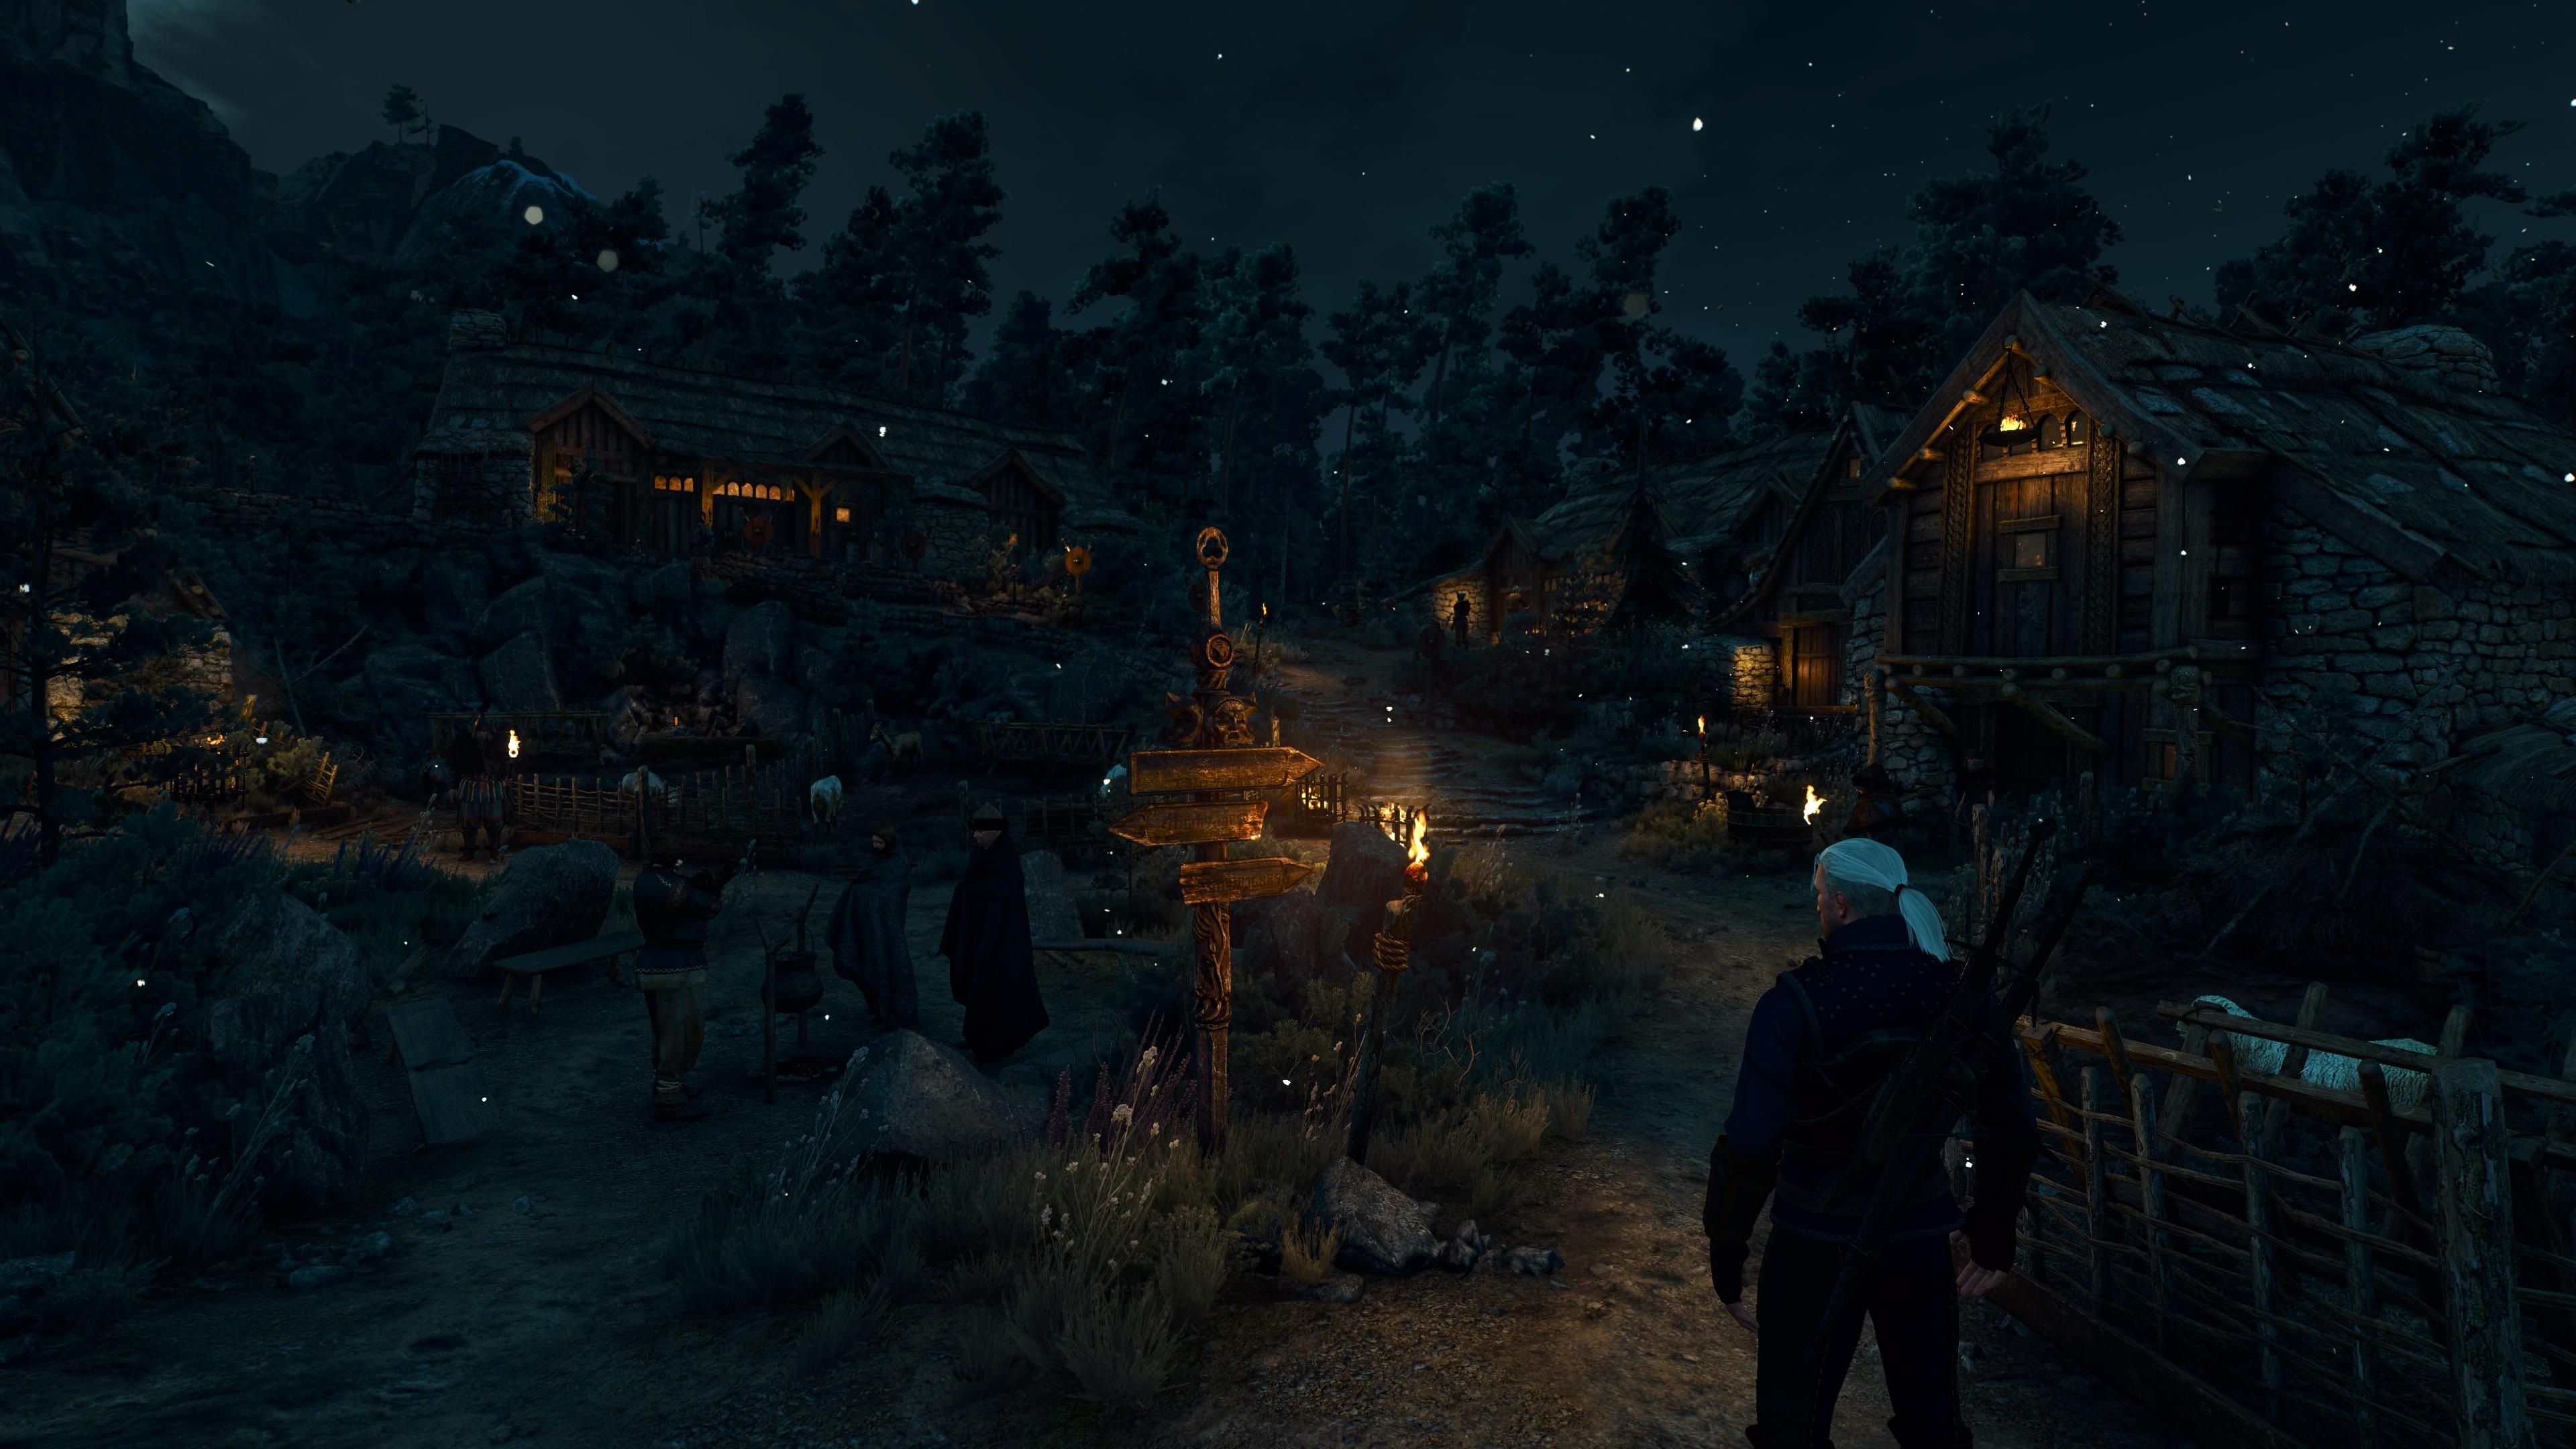 The Witcher 3 Super-Resolution 2017.12.22 - 15.11.50.74.jpg - Witcher 3: Wild Hunt, the